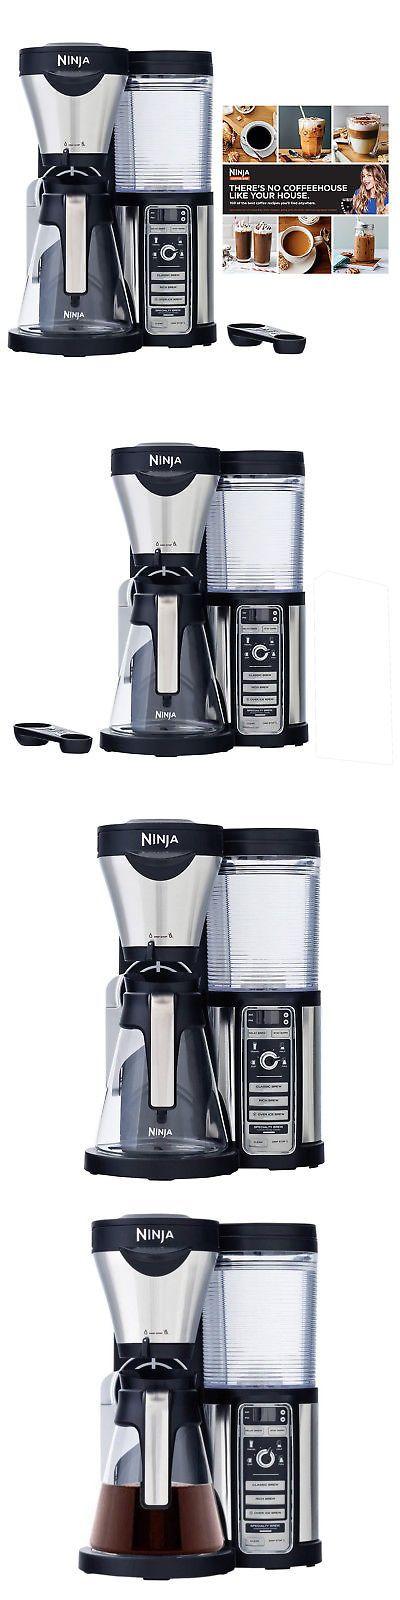 Filter Coffee Machines 184665 Ninja Cf080 Coffee Bar Auto Iq 1 Touch Maker With Glass Carafe 100 Recipe Book Filter Coffee Machine Glass Carafe Coffee Bar